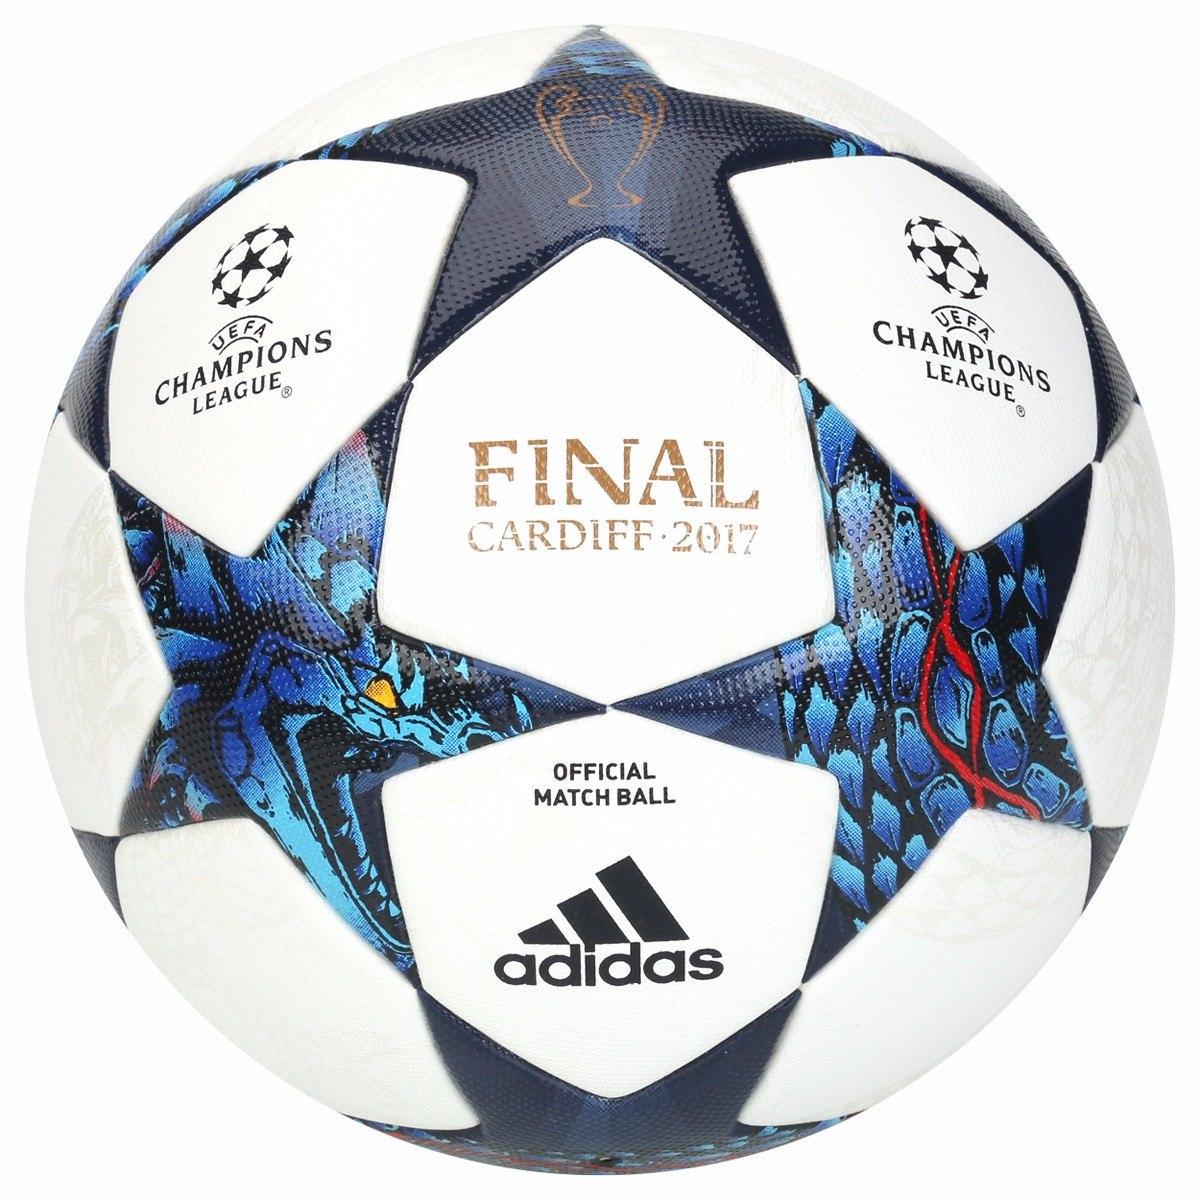 16097f6163975 Bola Campo Uefa Finale Oficial Jogo Cardiff 17 adidas-netfut - R ...